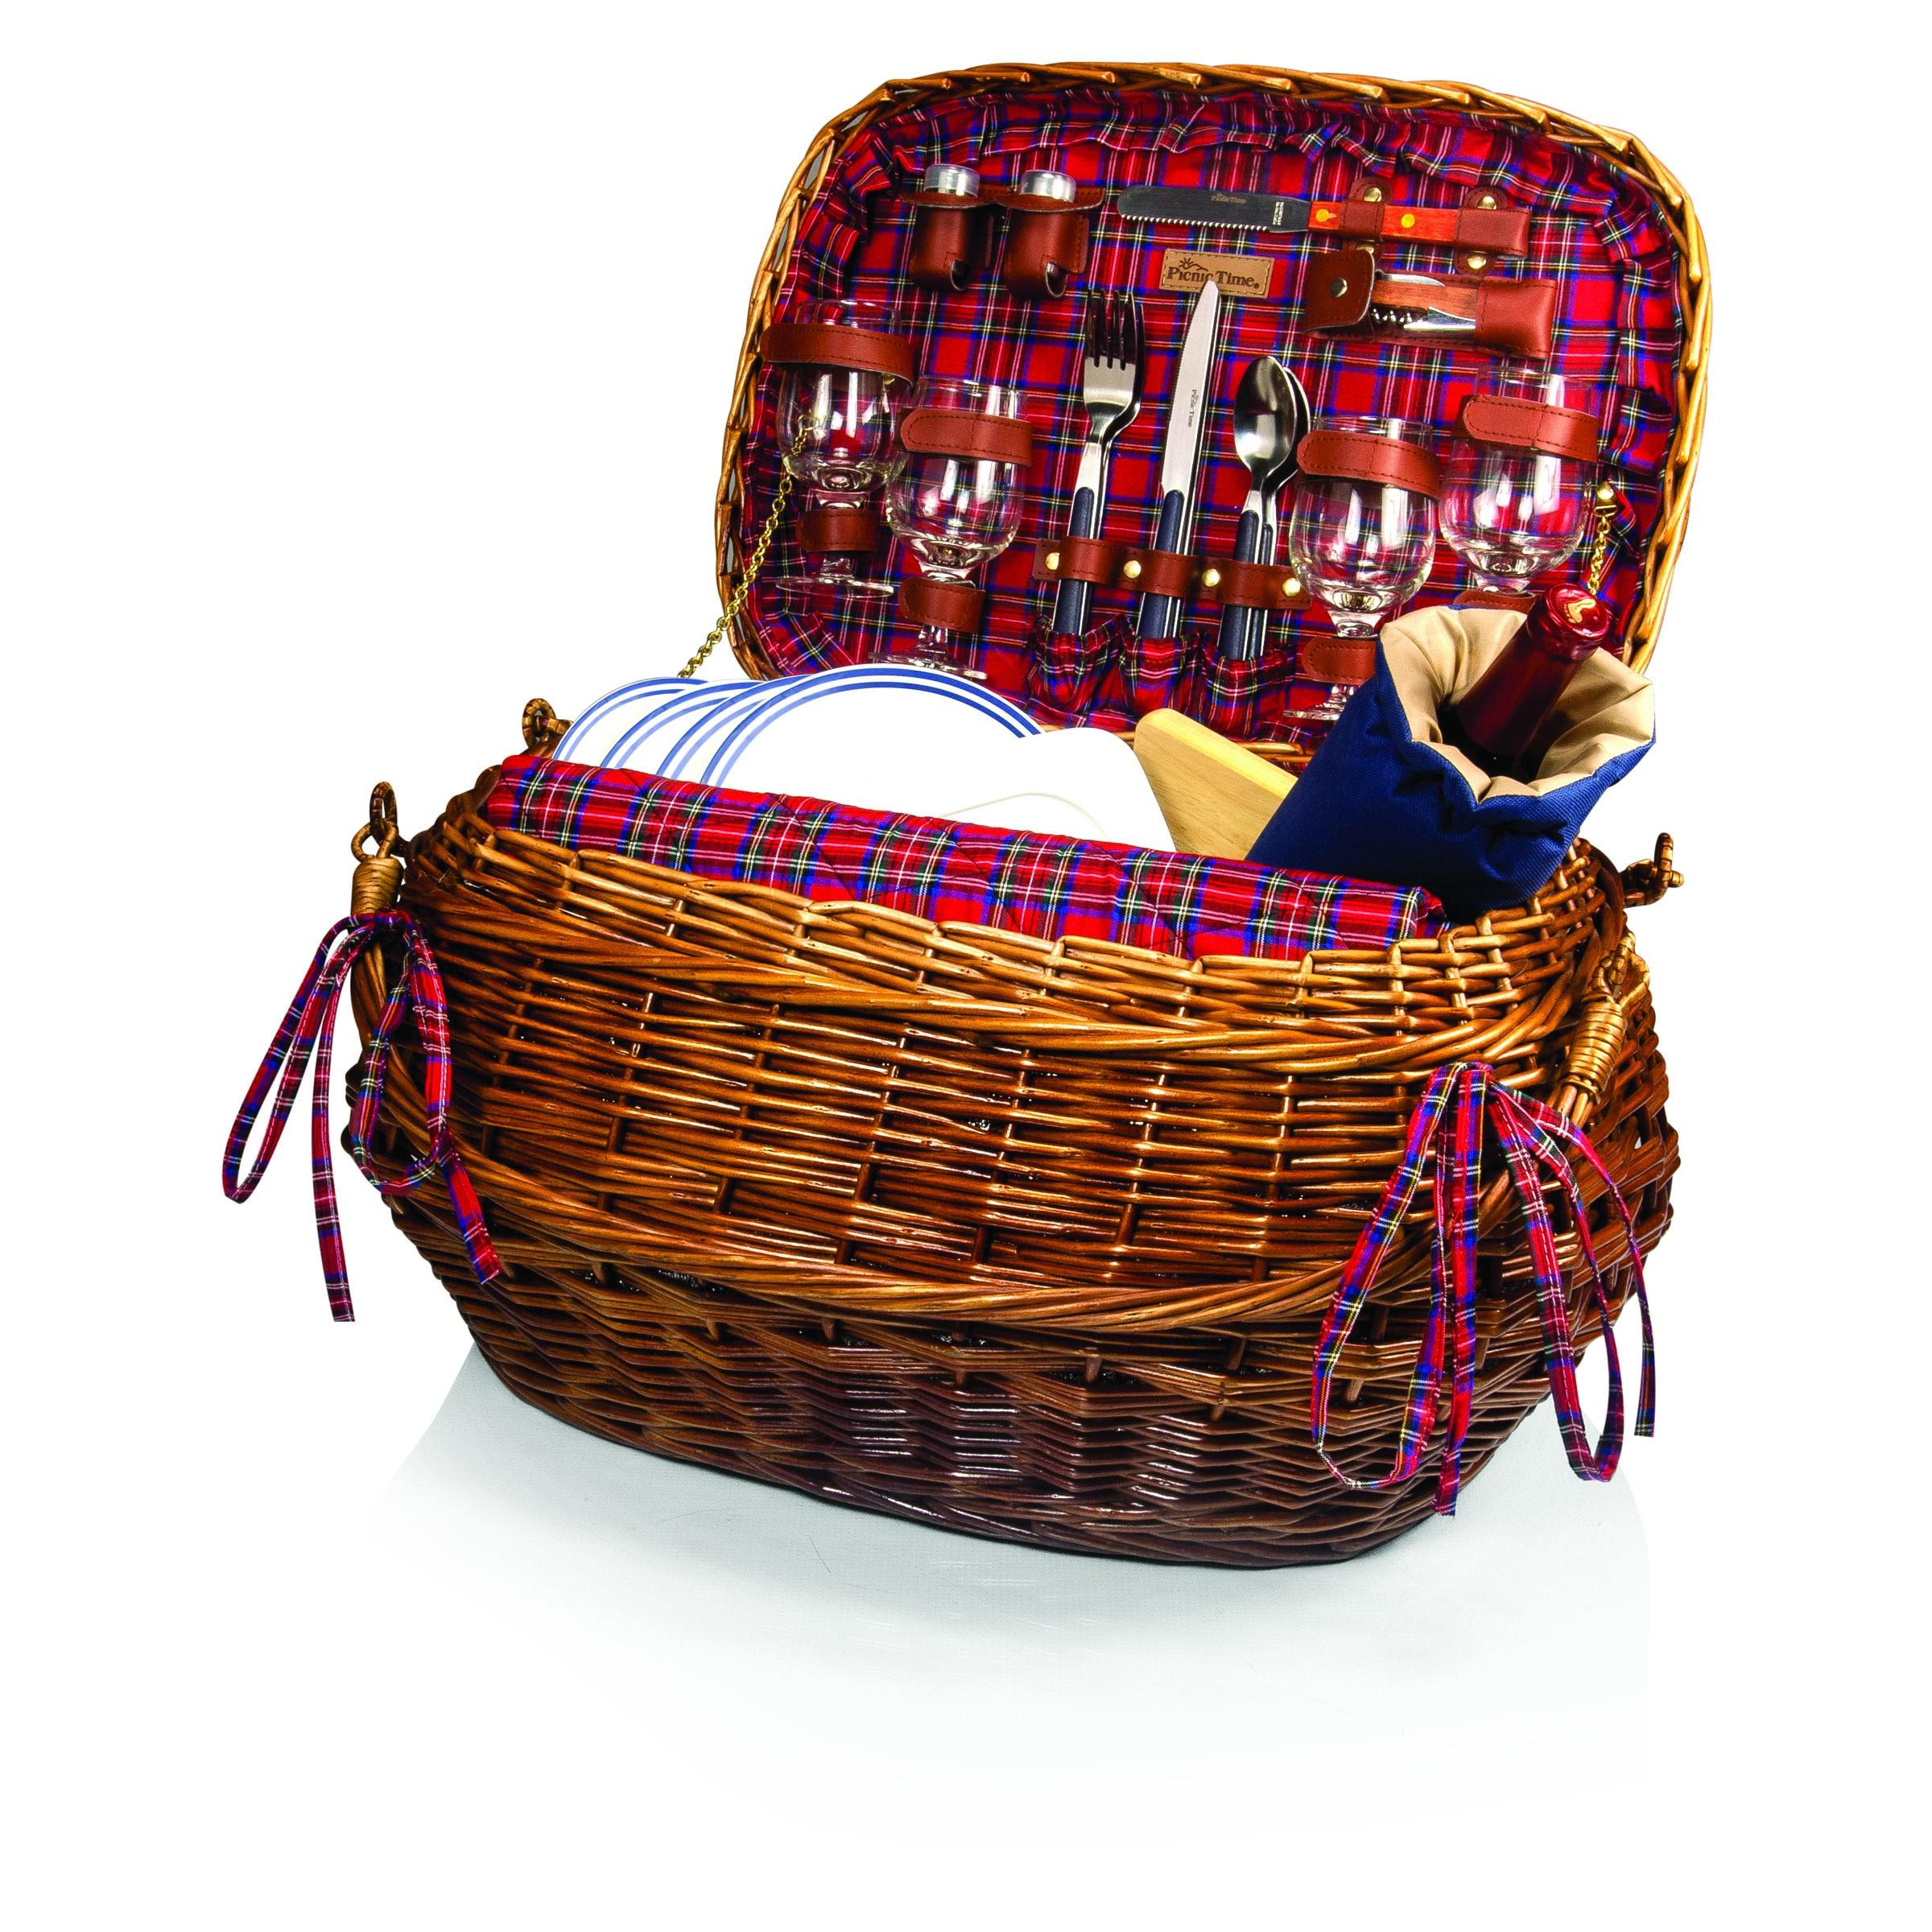 Highlander Picnic Basket Set (Service for 4) - Free Shipping Today -  Overstock.com - 15320212